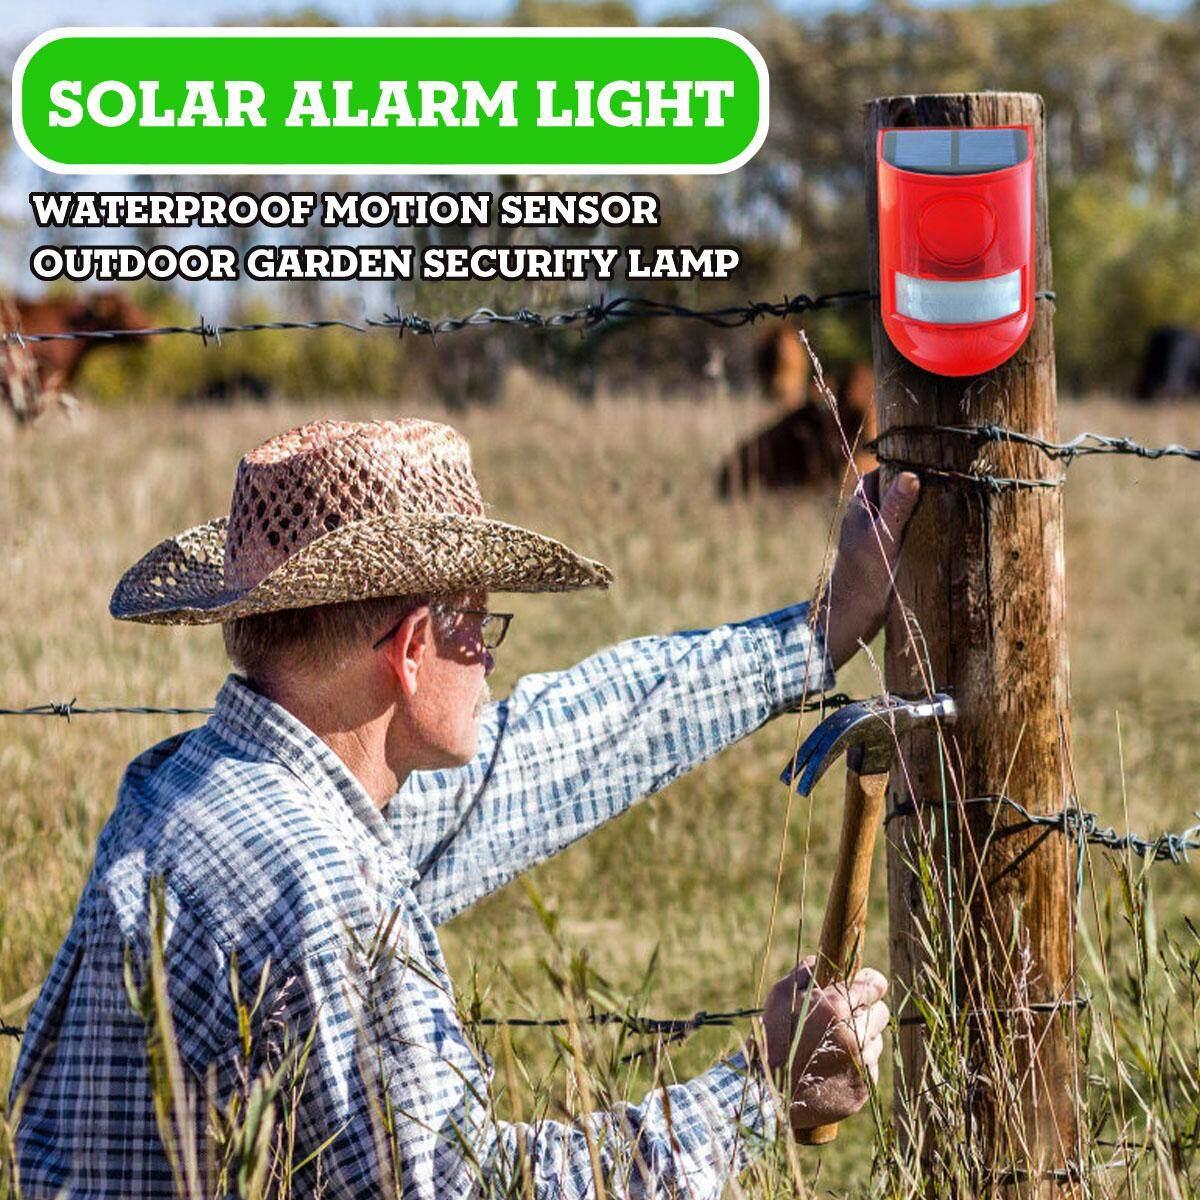 Solar Alarm Light Wireless Waterproof Motion Sensor Outdoor Garden Security Lamp